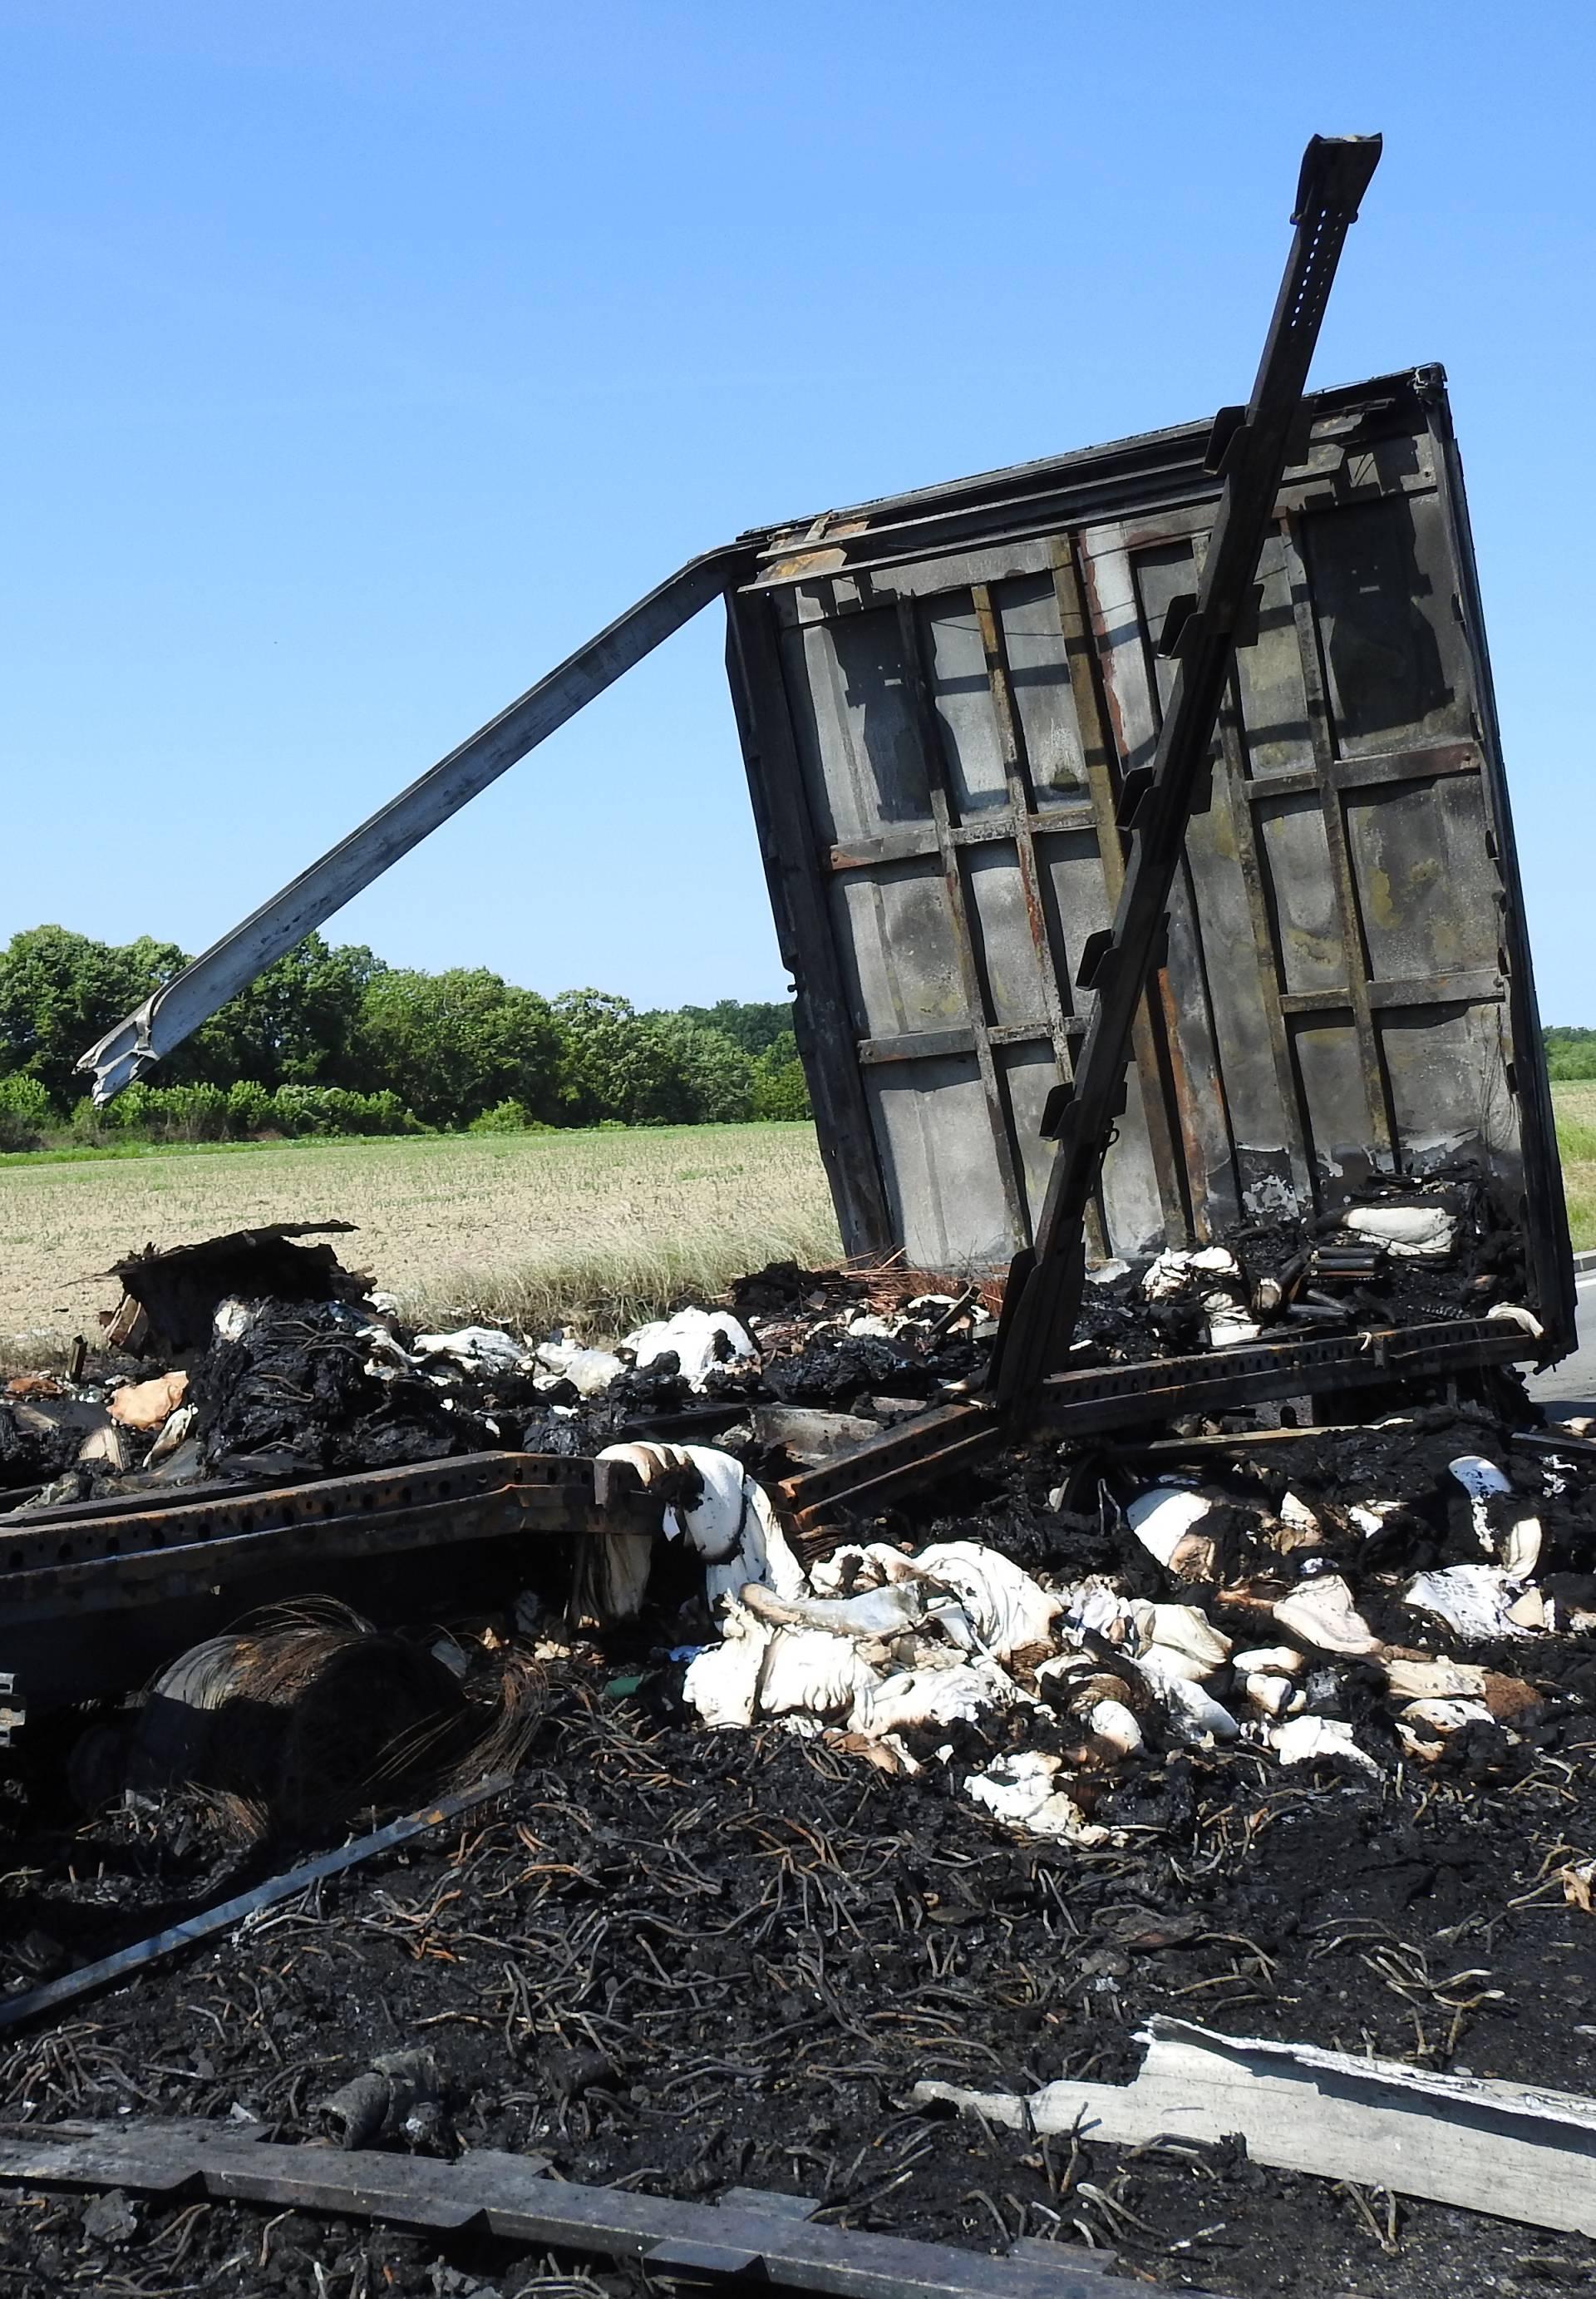 Drama kod Garešnice: U vožnji se zapalila prikolica kamiona